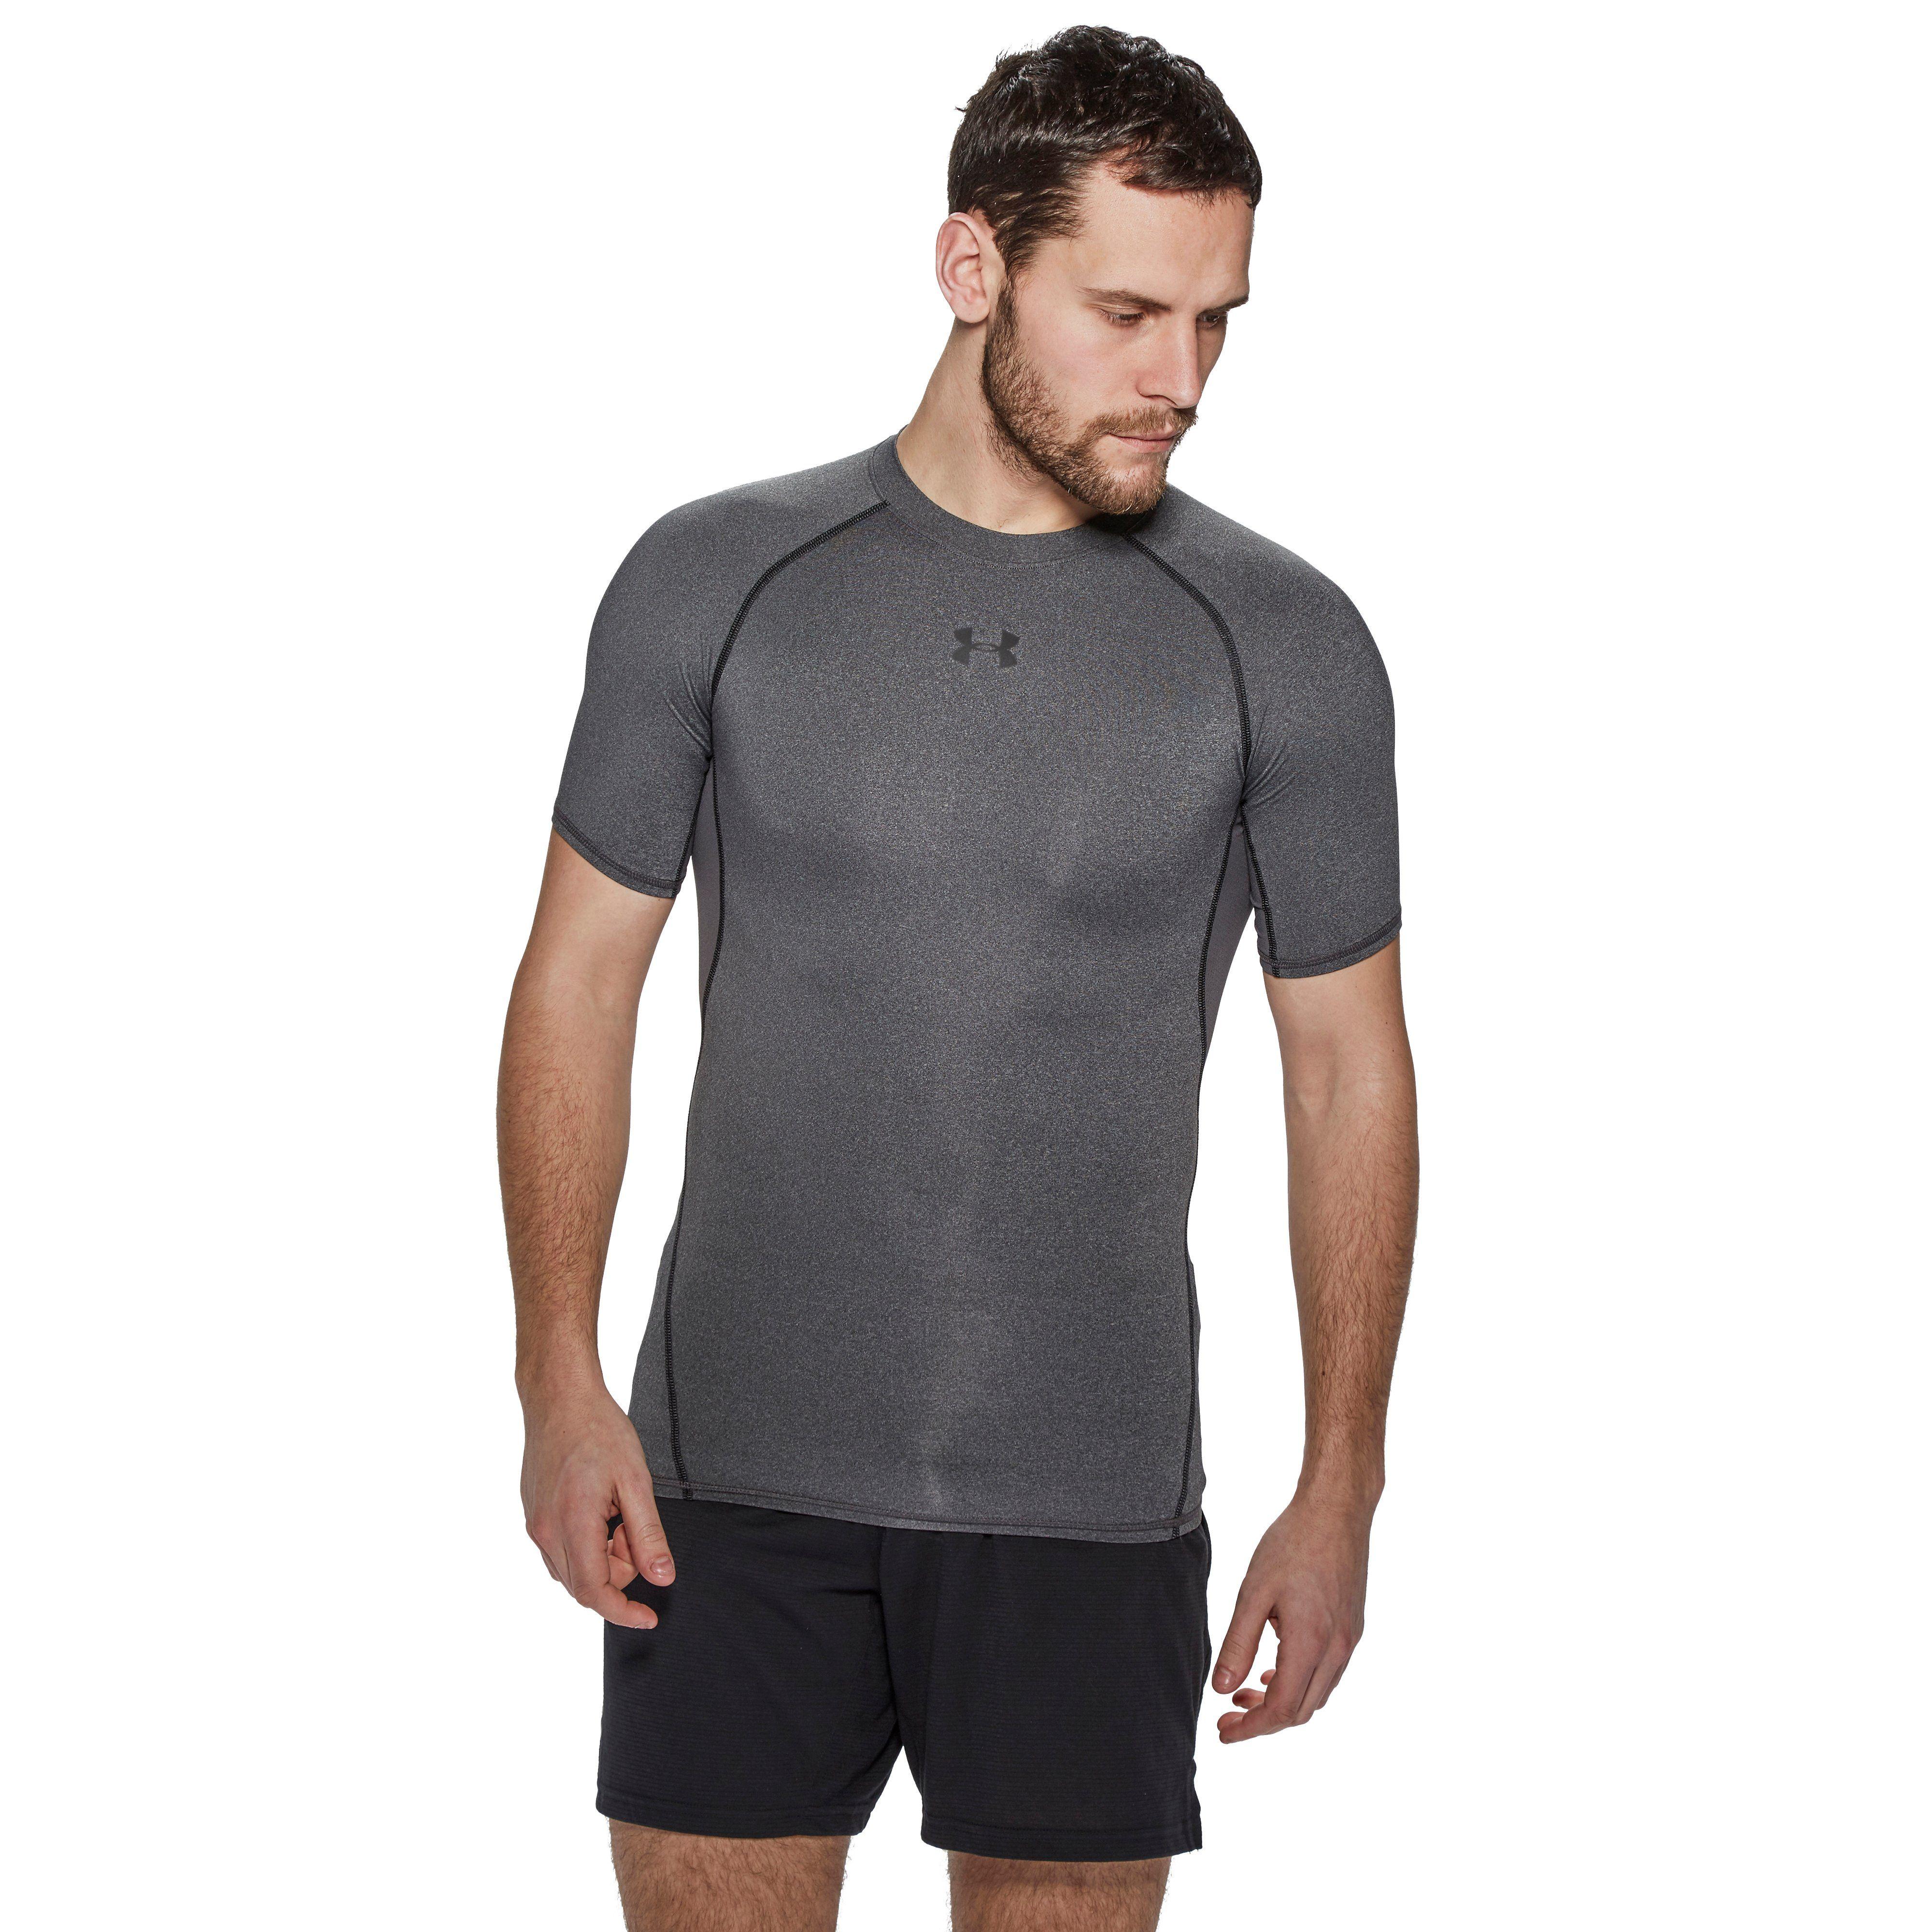 Under Armour HeatGear Armour Short Sleeve Compression Men's Shirt